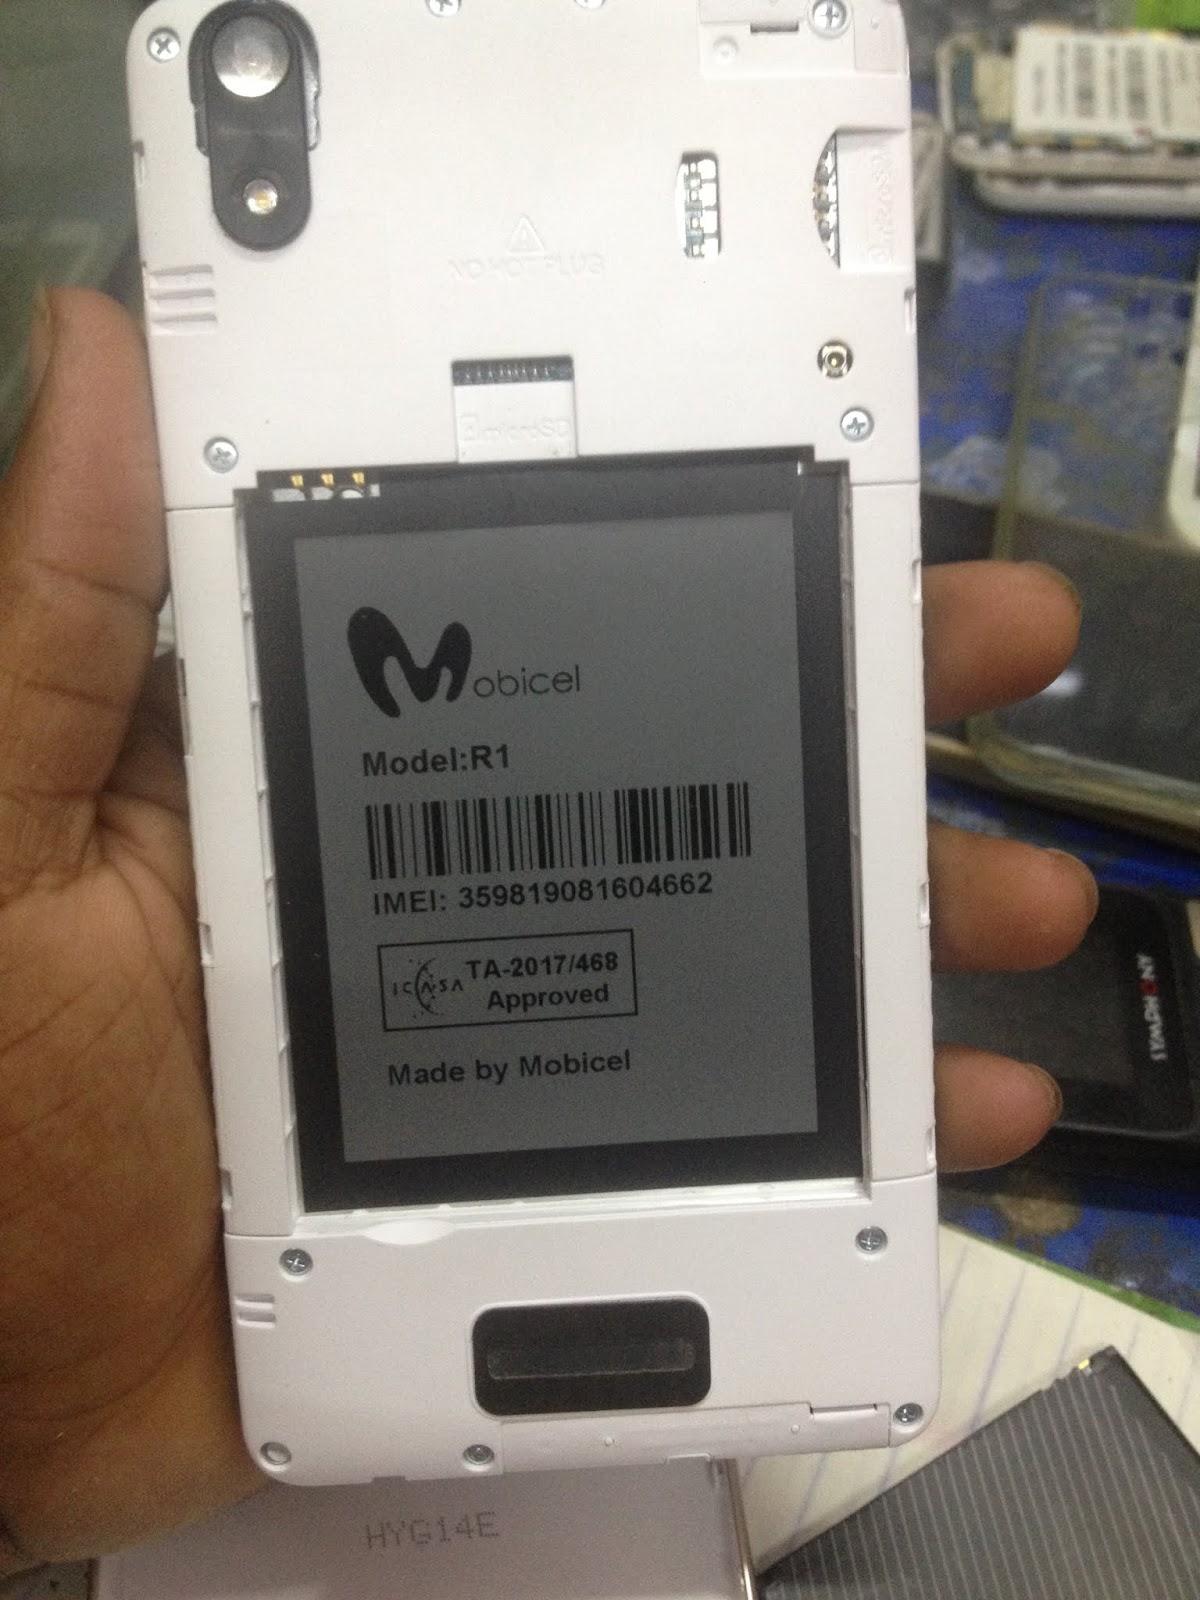 Mint M4cr Firmware